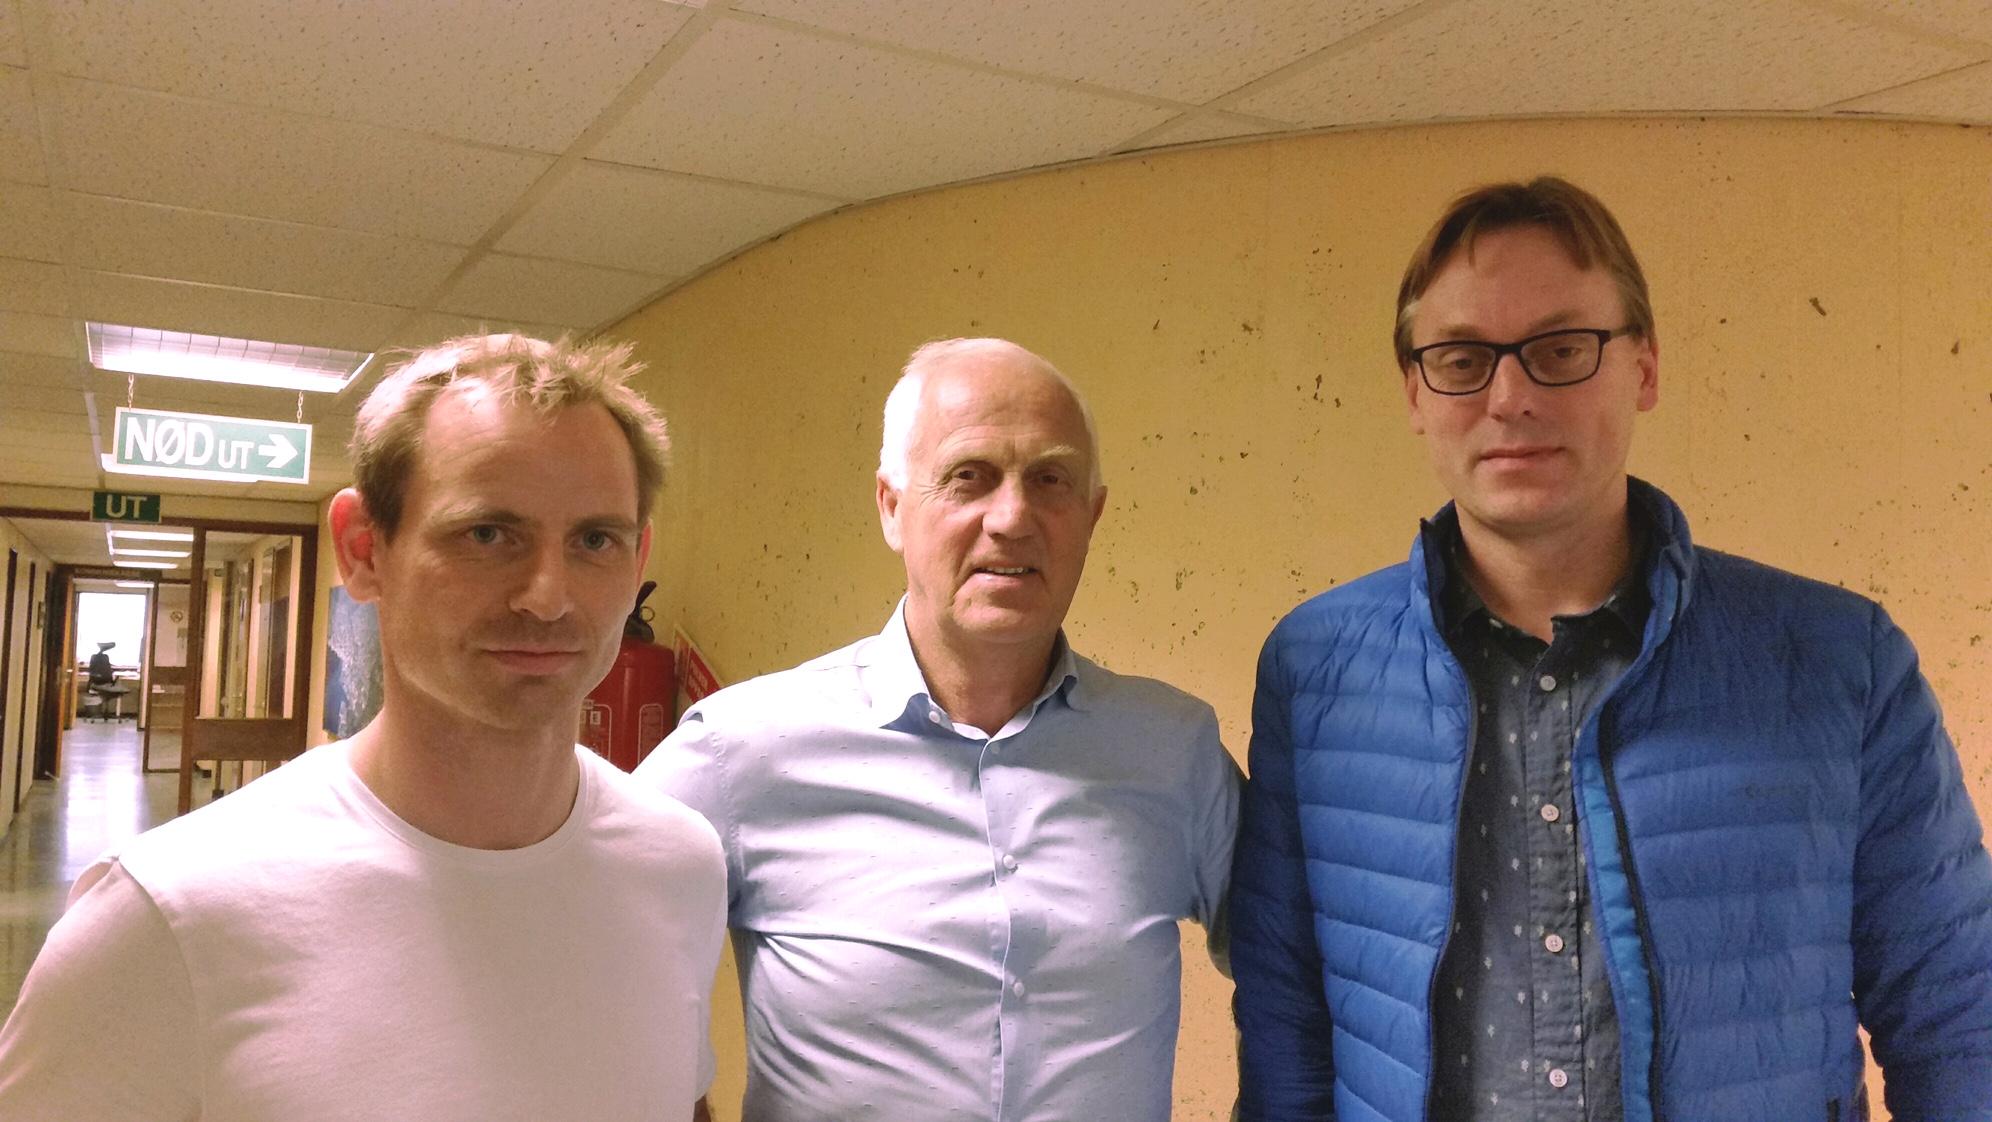 Øystein Mårstøl; prosjektleiar i Ørsta kommune, Stein Aam; ordførar i Ørsta kommune, og Henning Heltne; Tømrer Service AS.